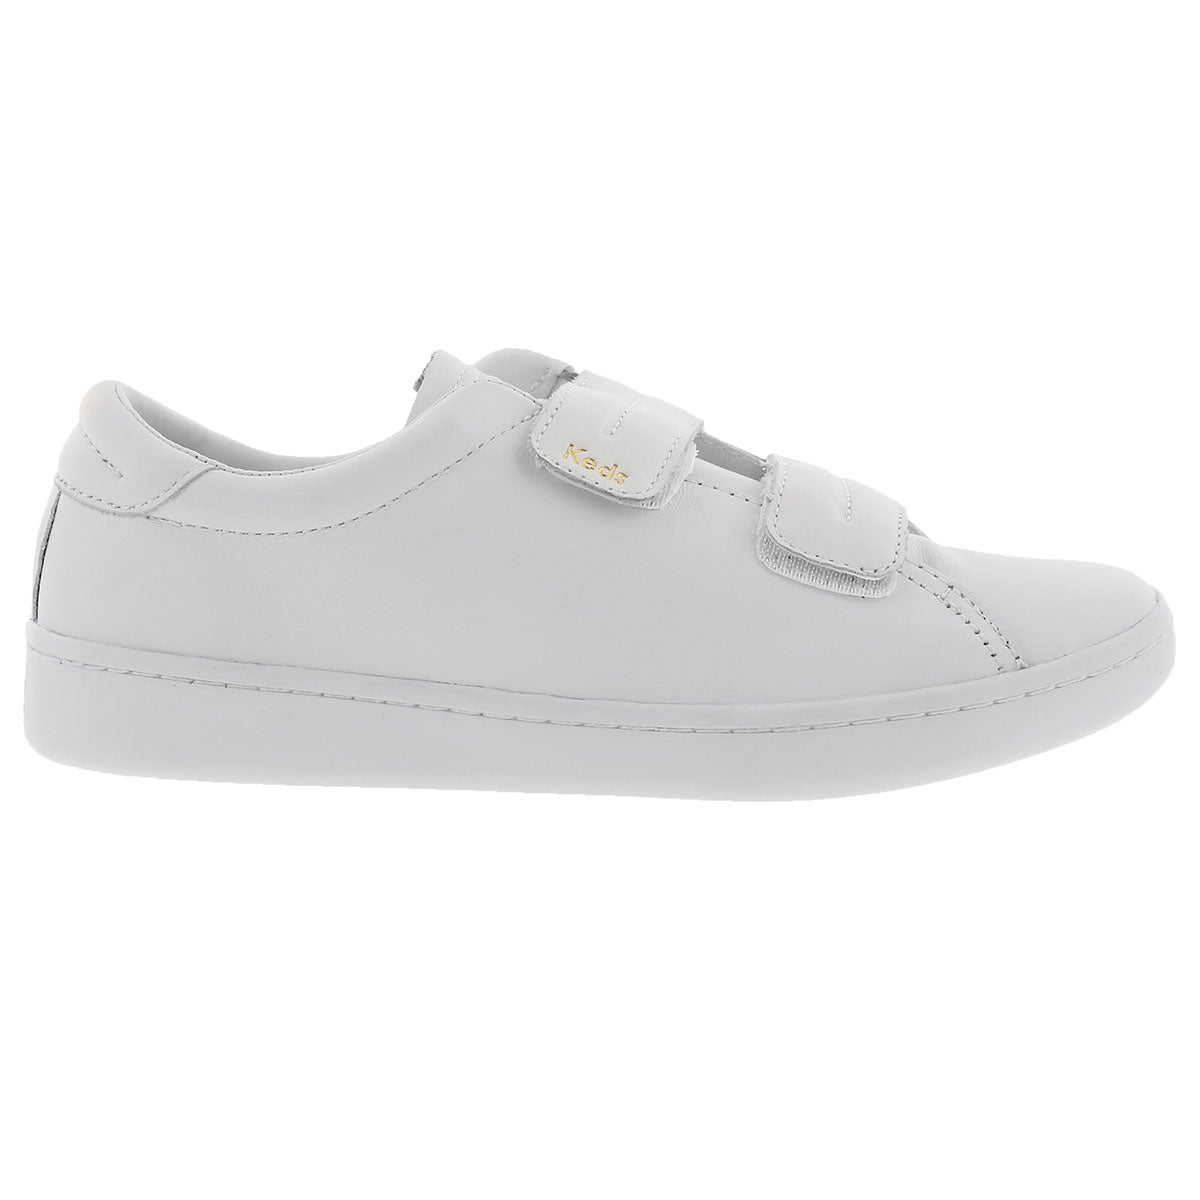 Lds Ace wht hook & loop lthr sneaker